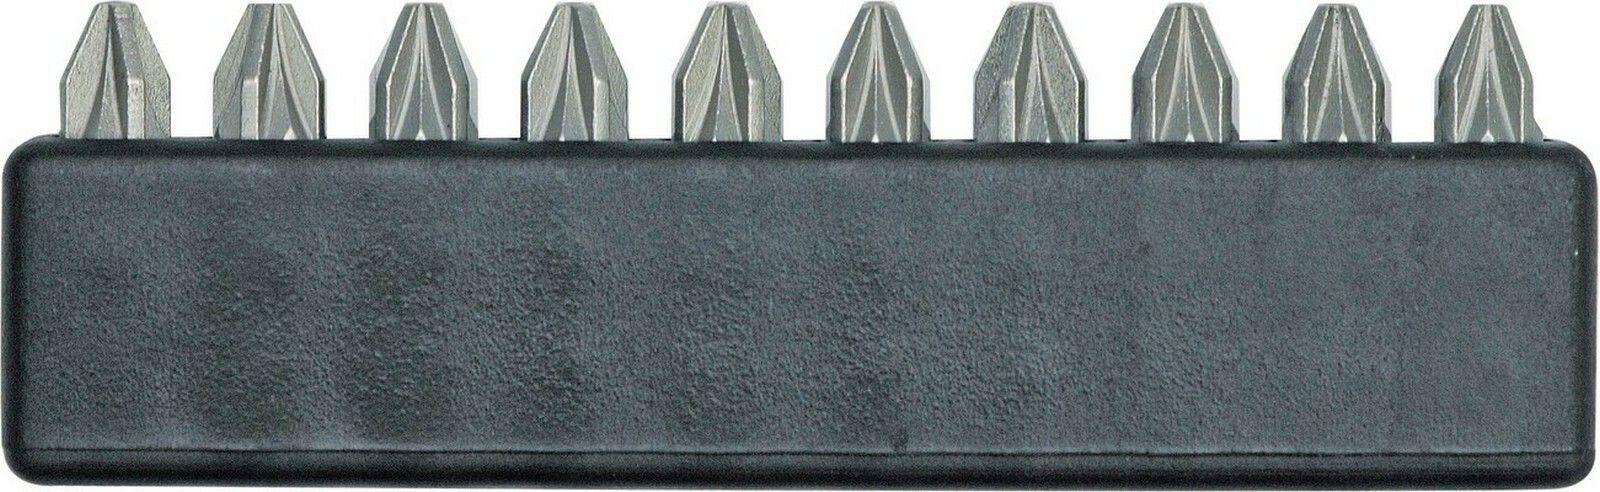 Sada bitů PZ2 x 25 mm 10 ks TOYA